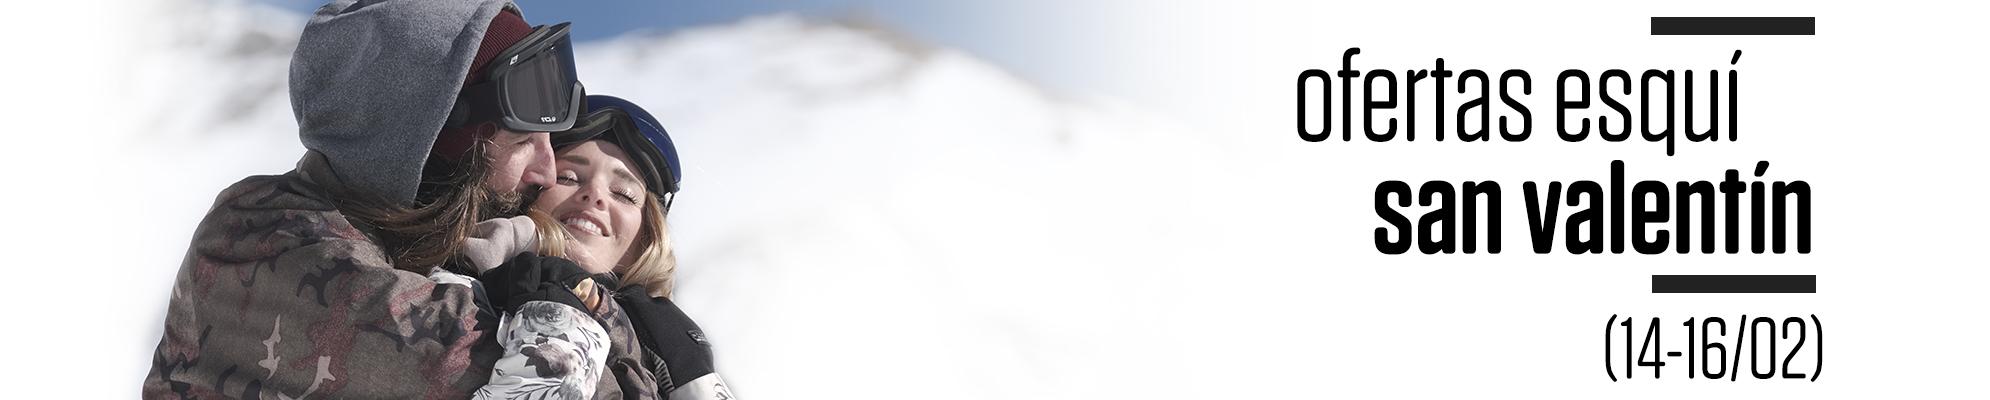 oferta esqui san valentin aramon formigal panticosa cerler